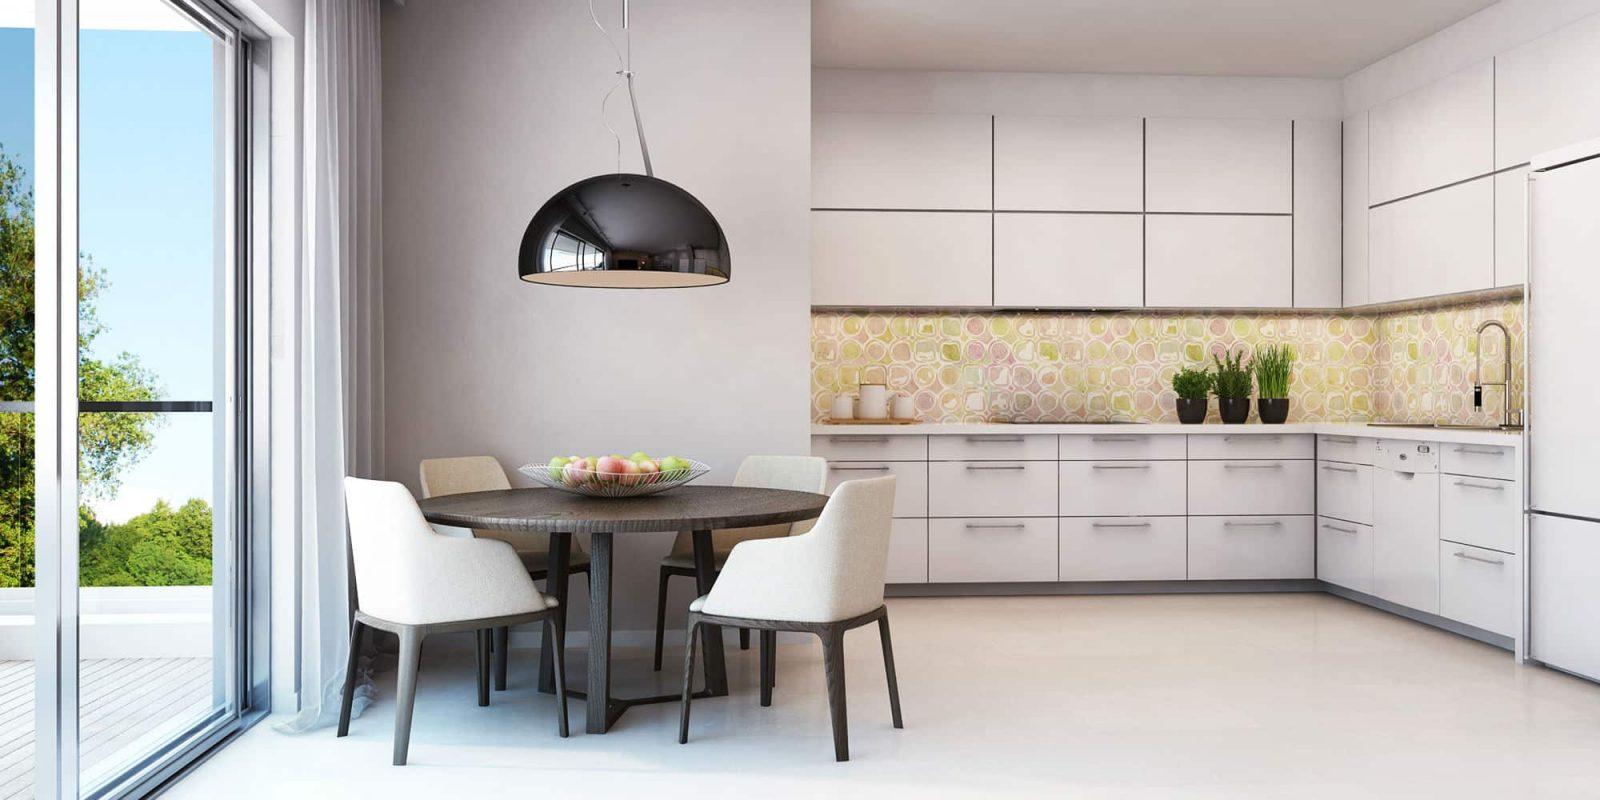 Web3D - הדמיה אדריכלית - צילום של מטבח